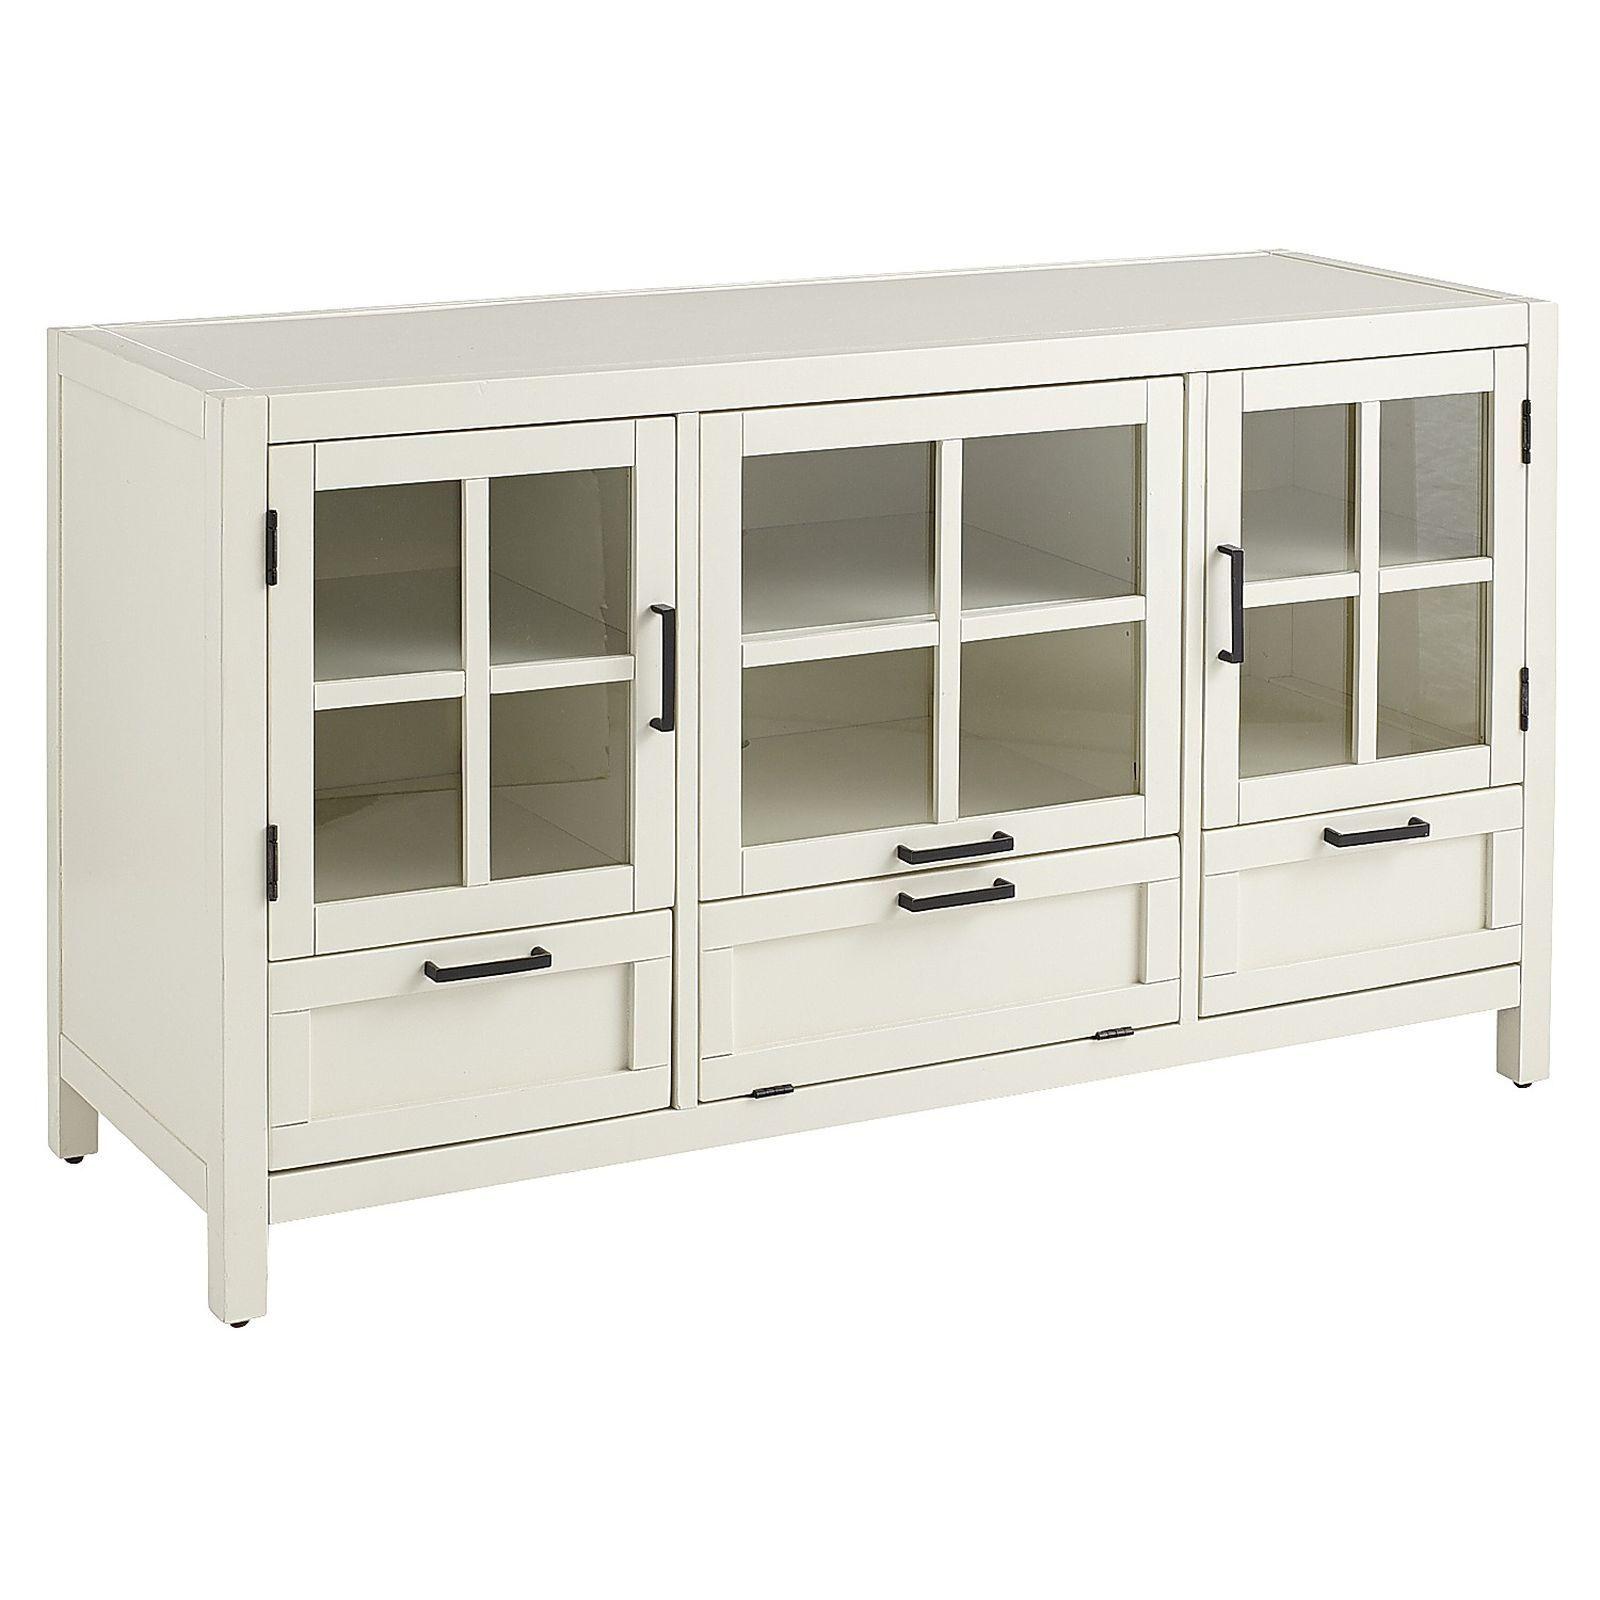 Antique White Modular 52 Tv Stand Furniture Furniture Sale White Tv Stands